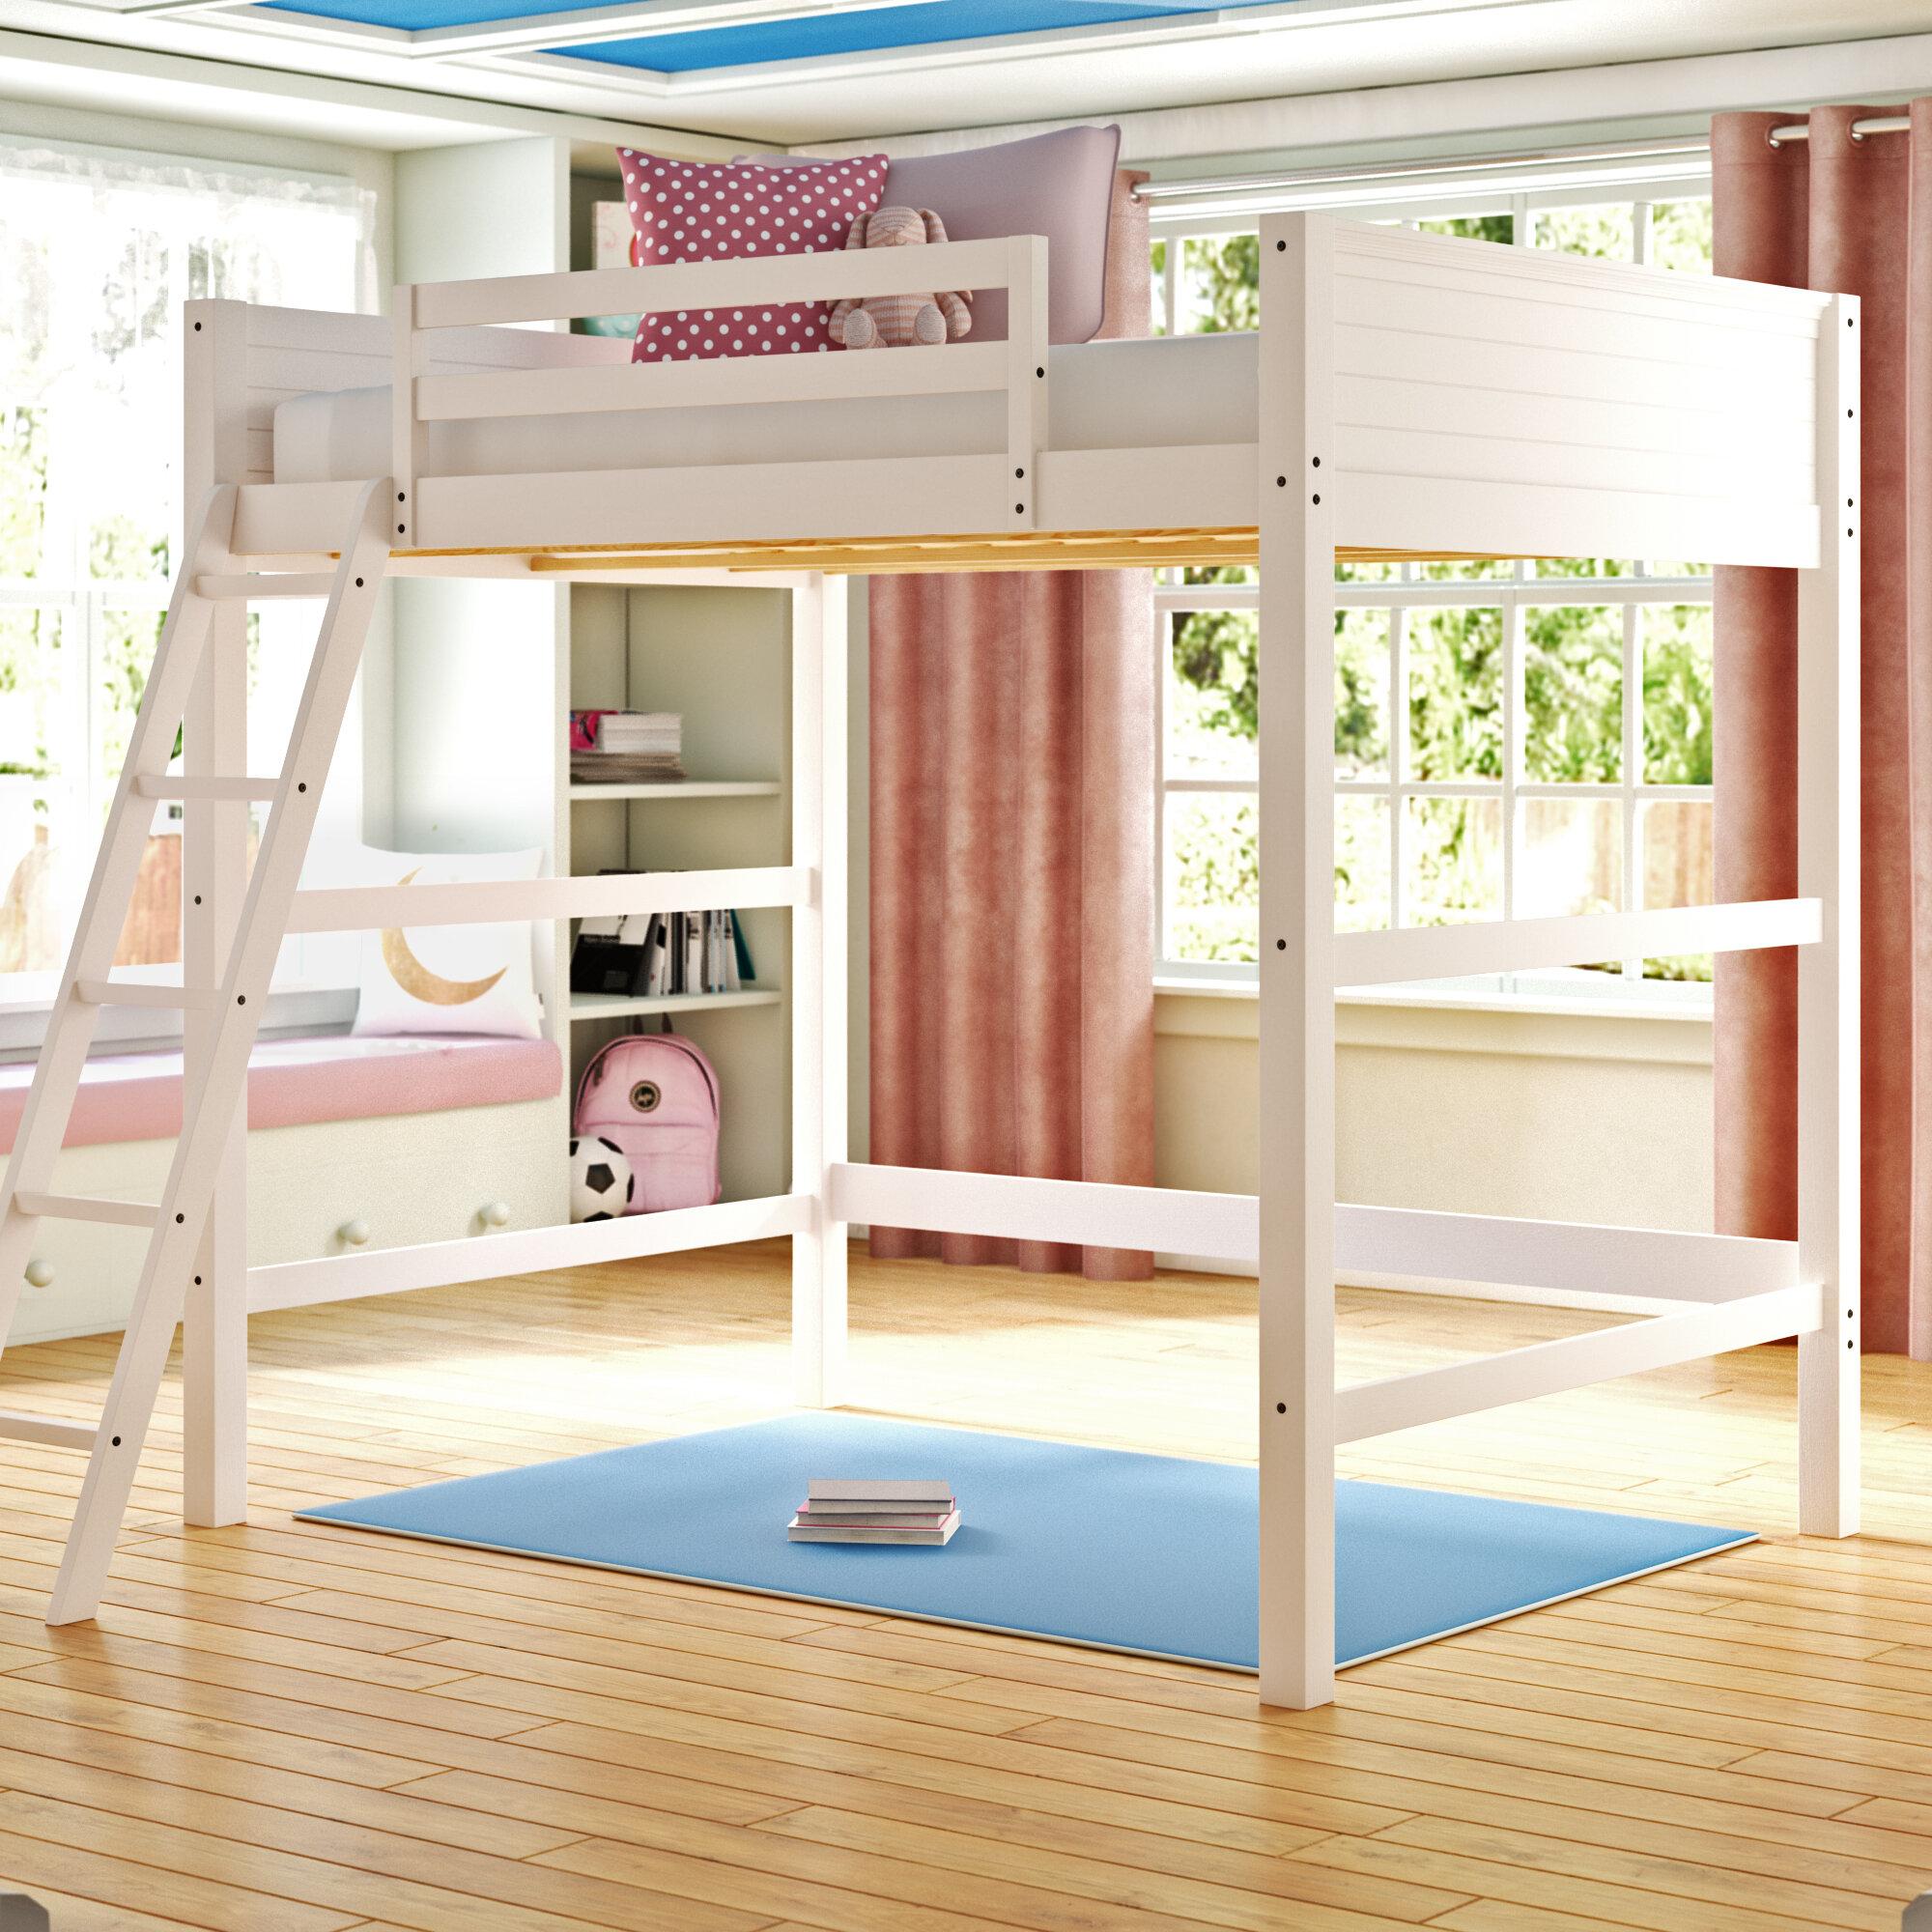 Full Loft Kids Beds Youu0027ll Love In 2019 | Wayfair